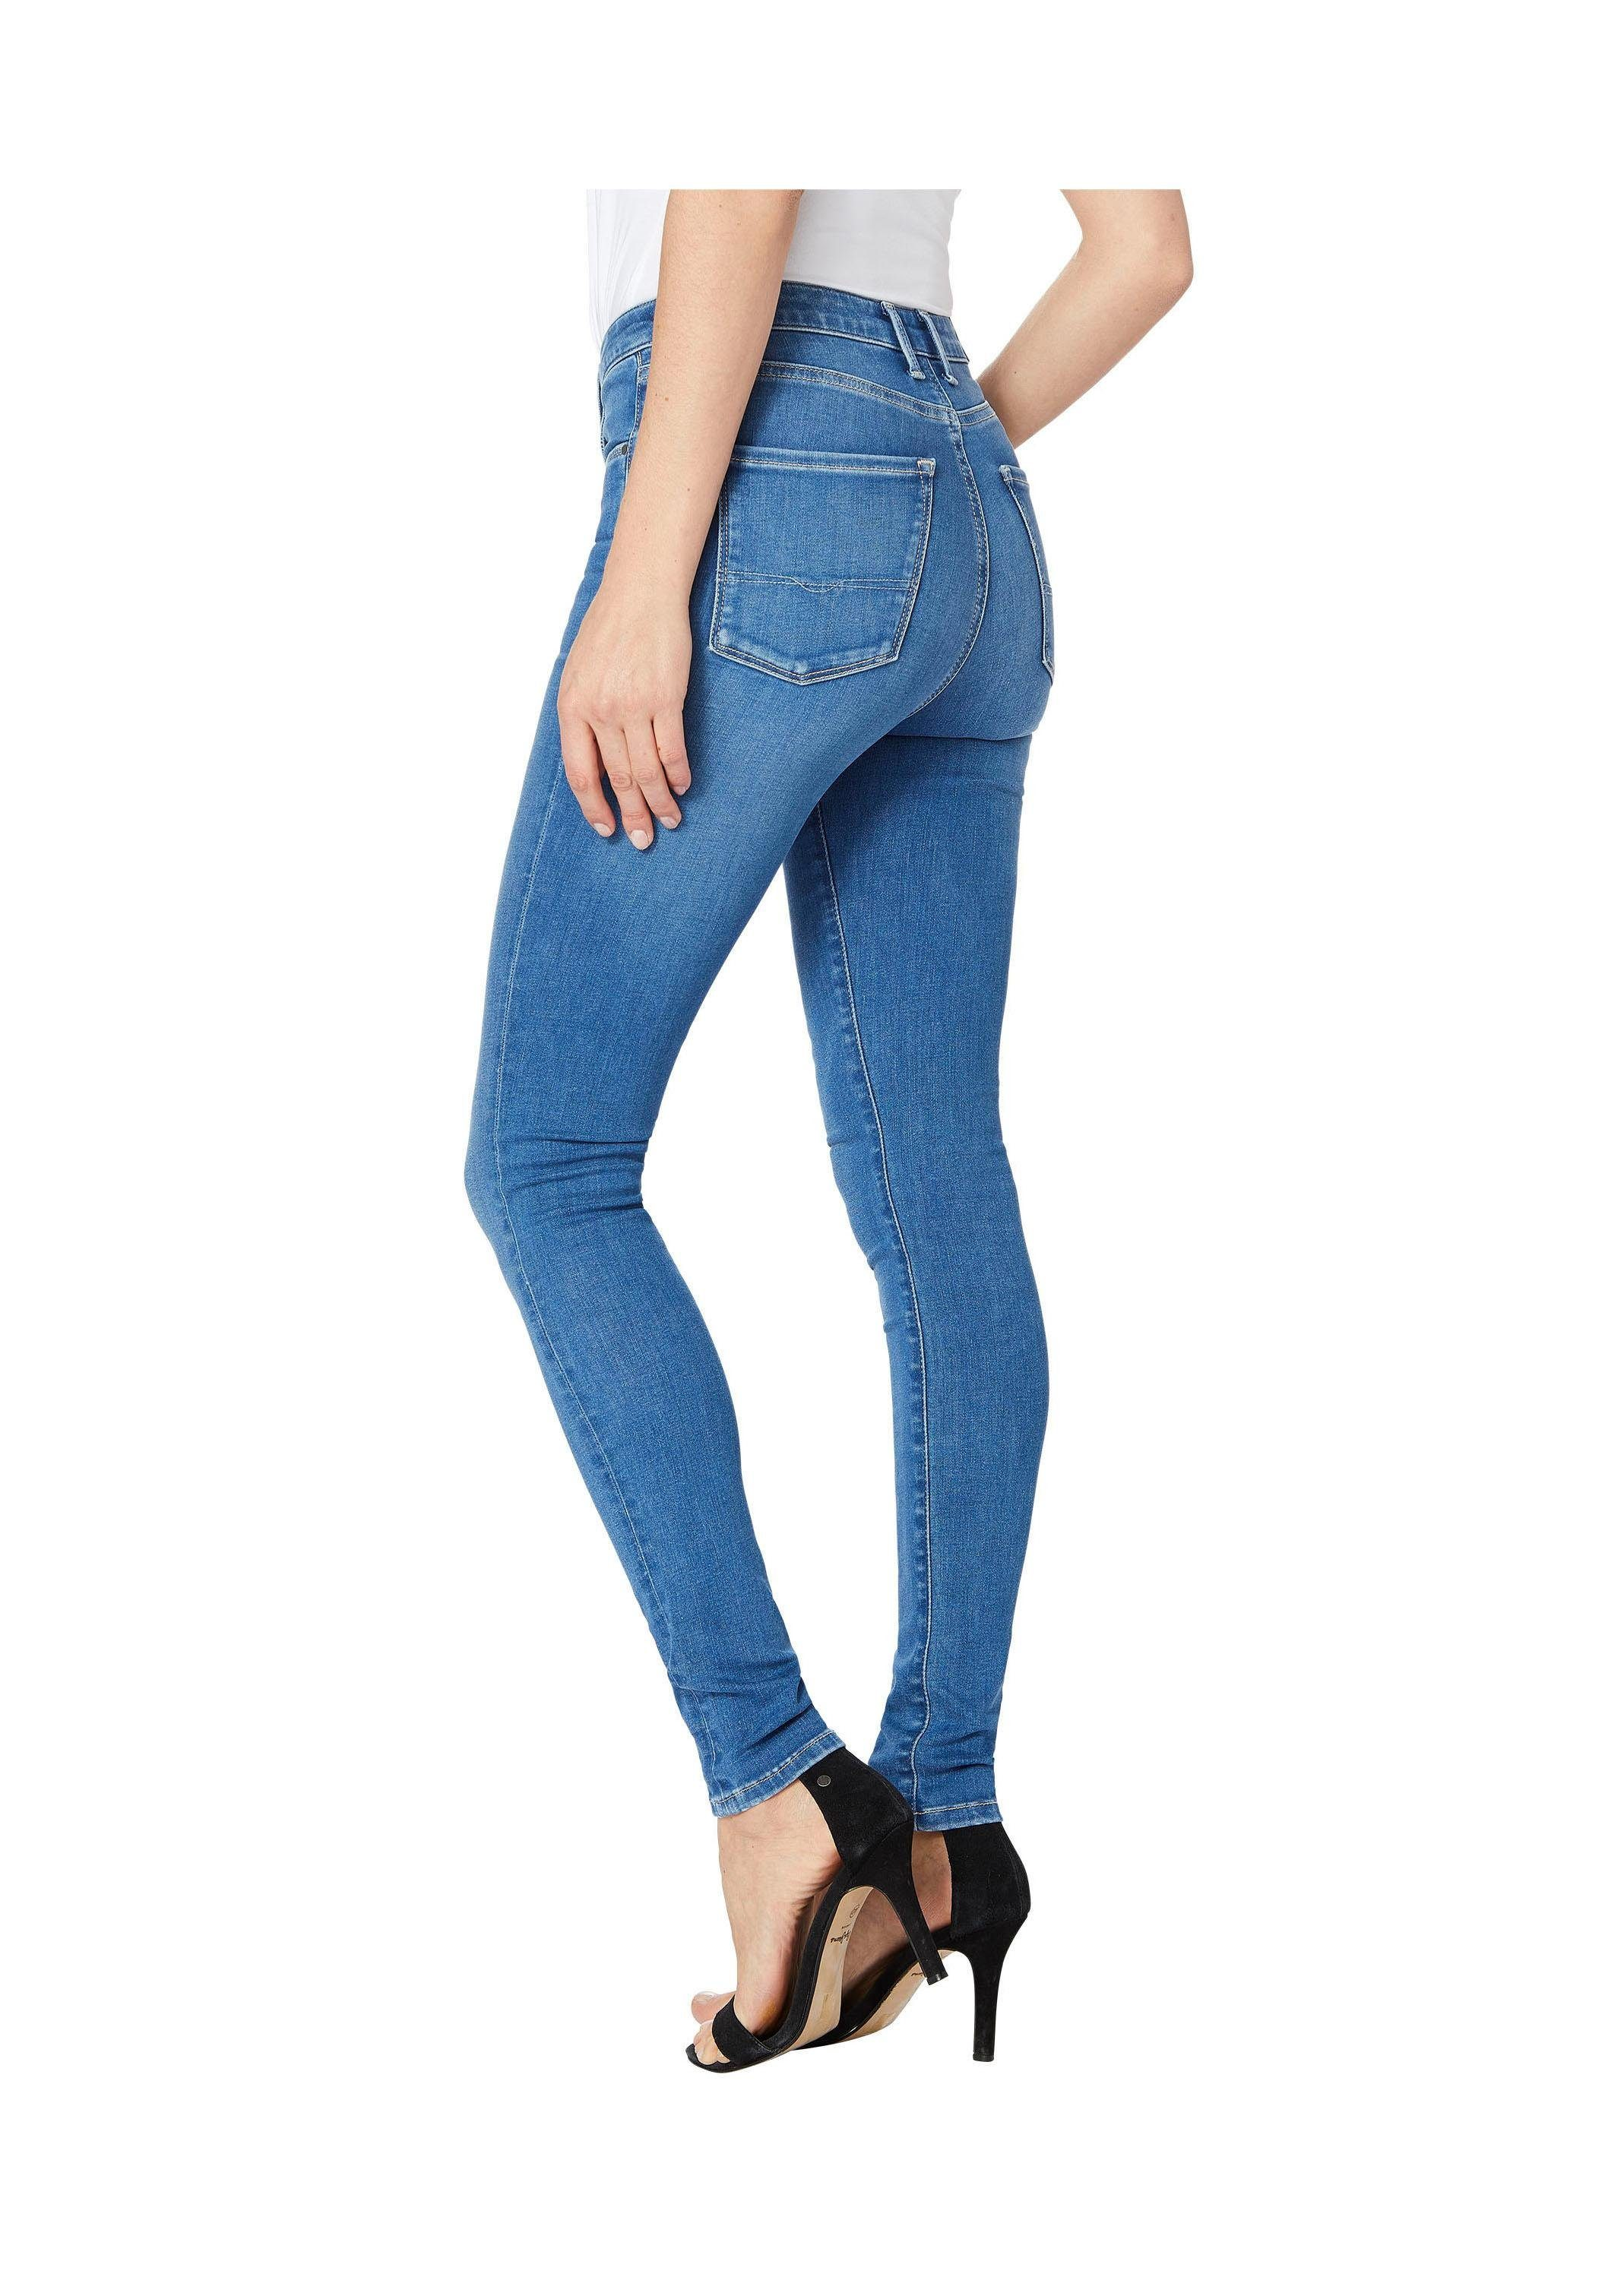 Pepe Jeans Skinny fit Jeans »REGENT« mit High Waist & Ankle Leg online kaufen   OTTO